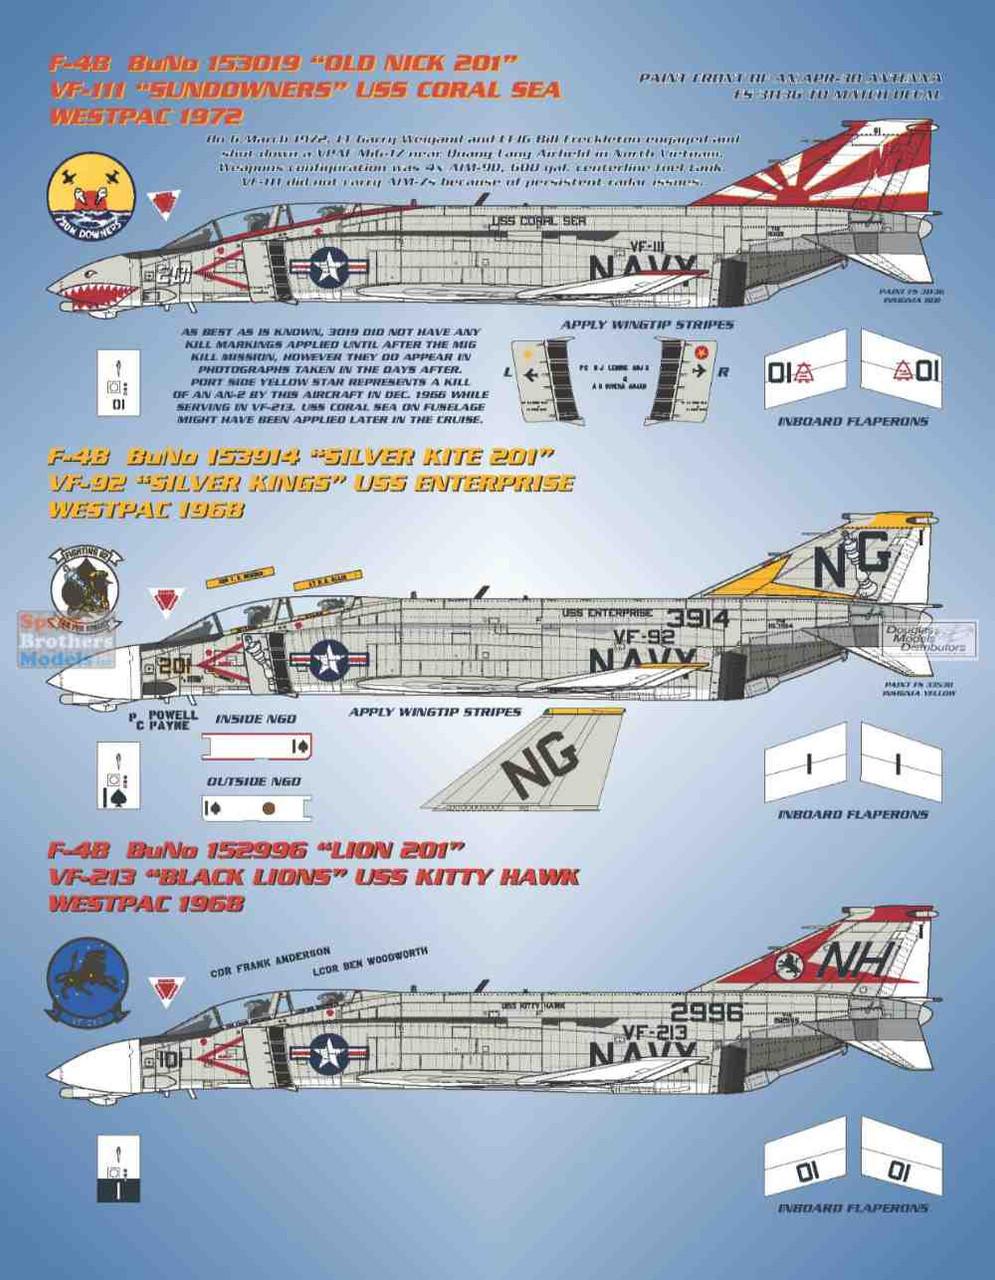 BMA48018 1:48 Bullseye Model Aviation Decals - F-4B Phantom II 'Fleet Phantoms II'